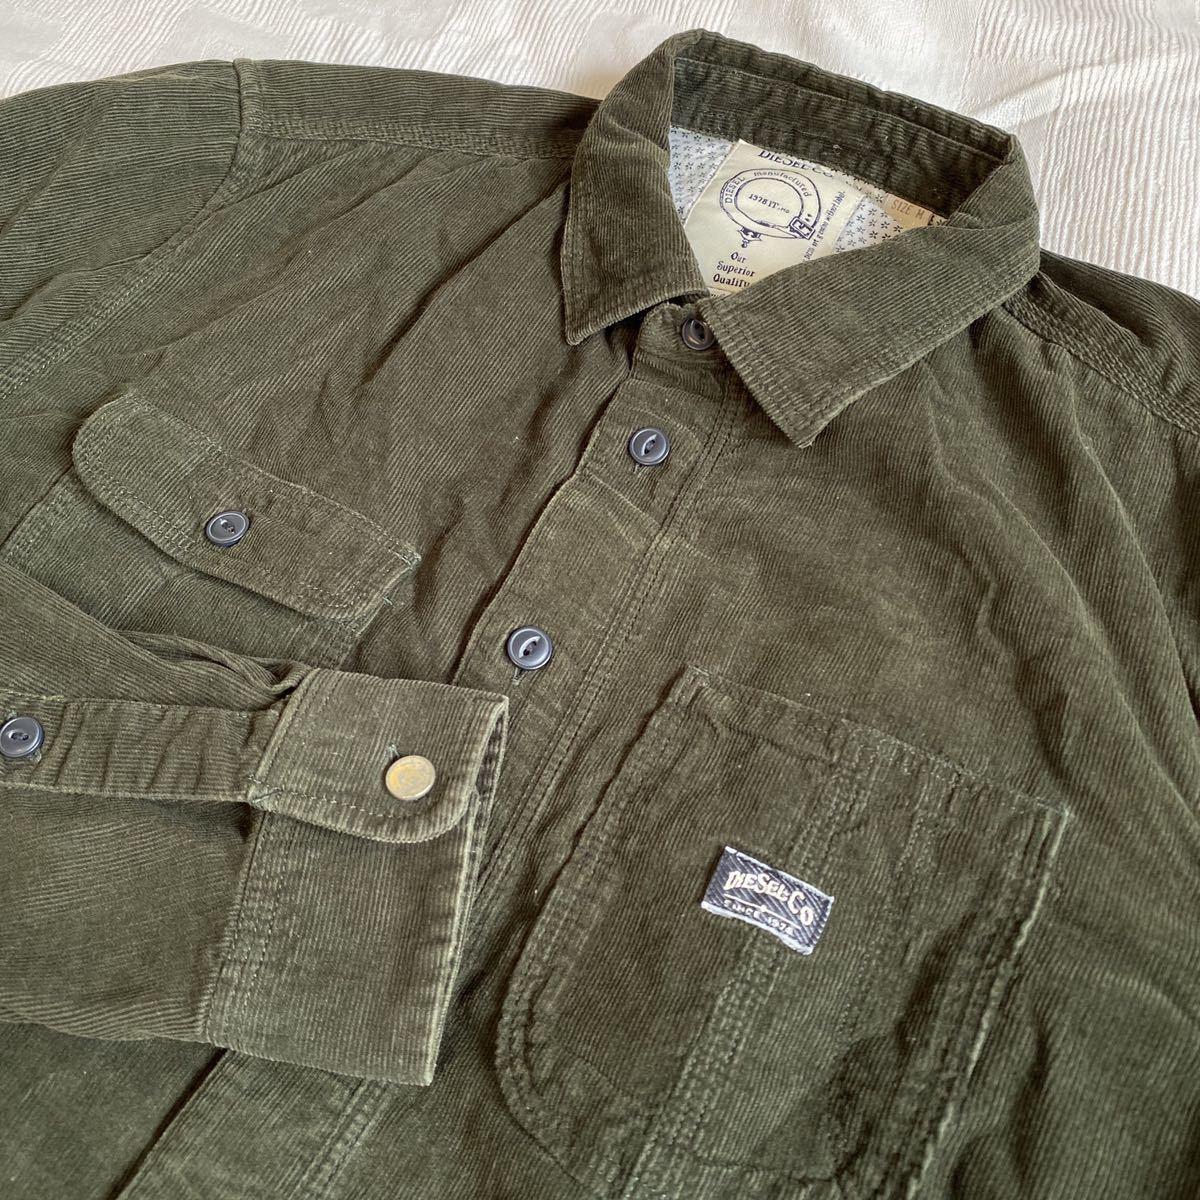 DIESEL ディーゼル◆ダークグリーン コーデュロイ 長袖シャツ サイズM ワークシャツ y20062101